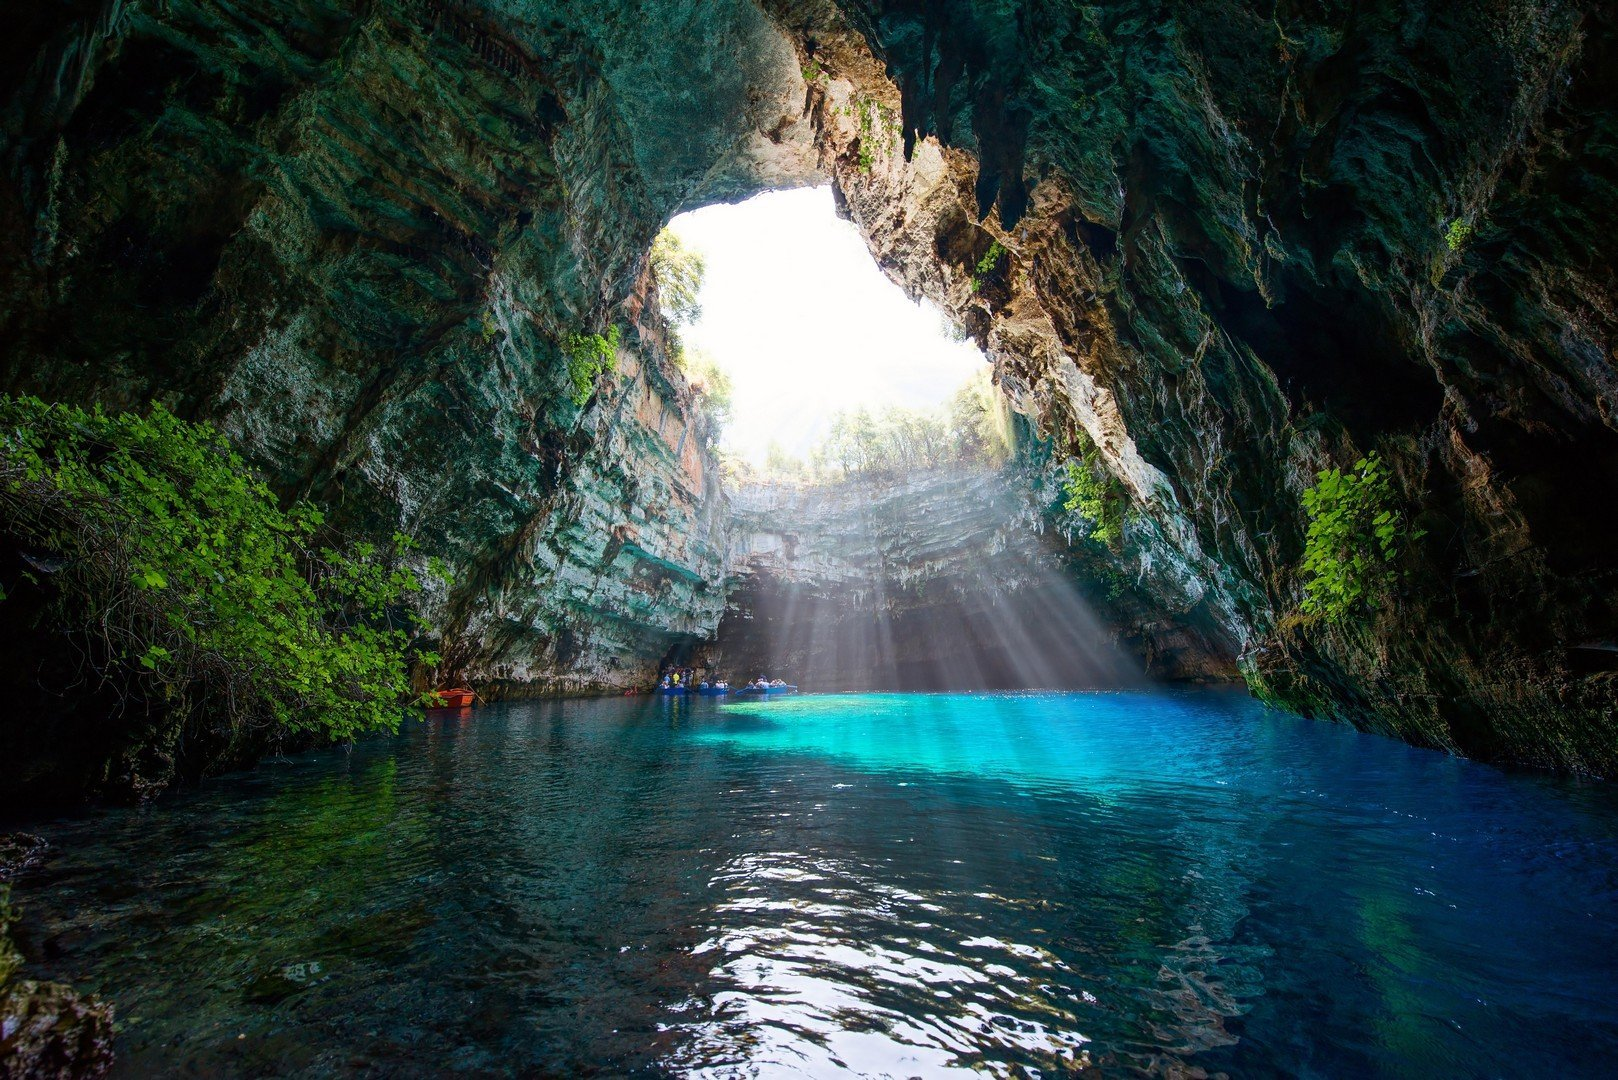 Famous melissani lake on Kefalonia island - Greece shutterstock_293479436